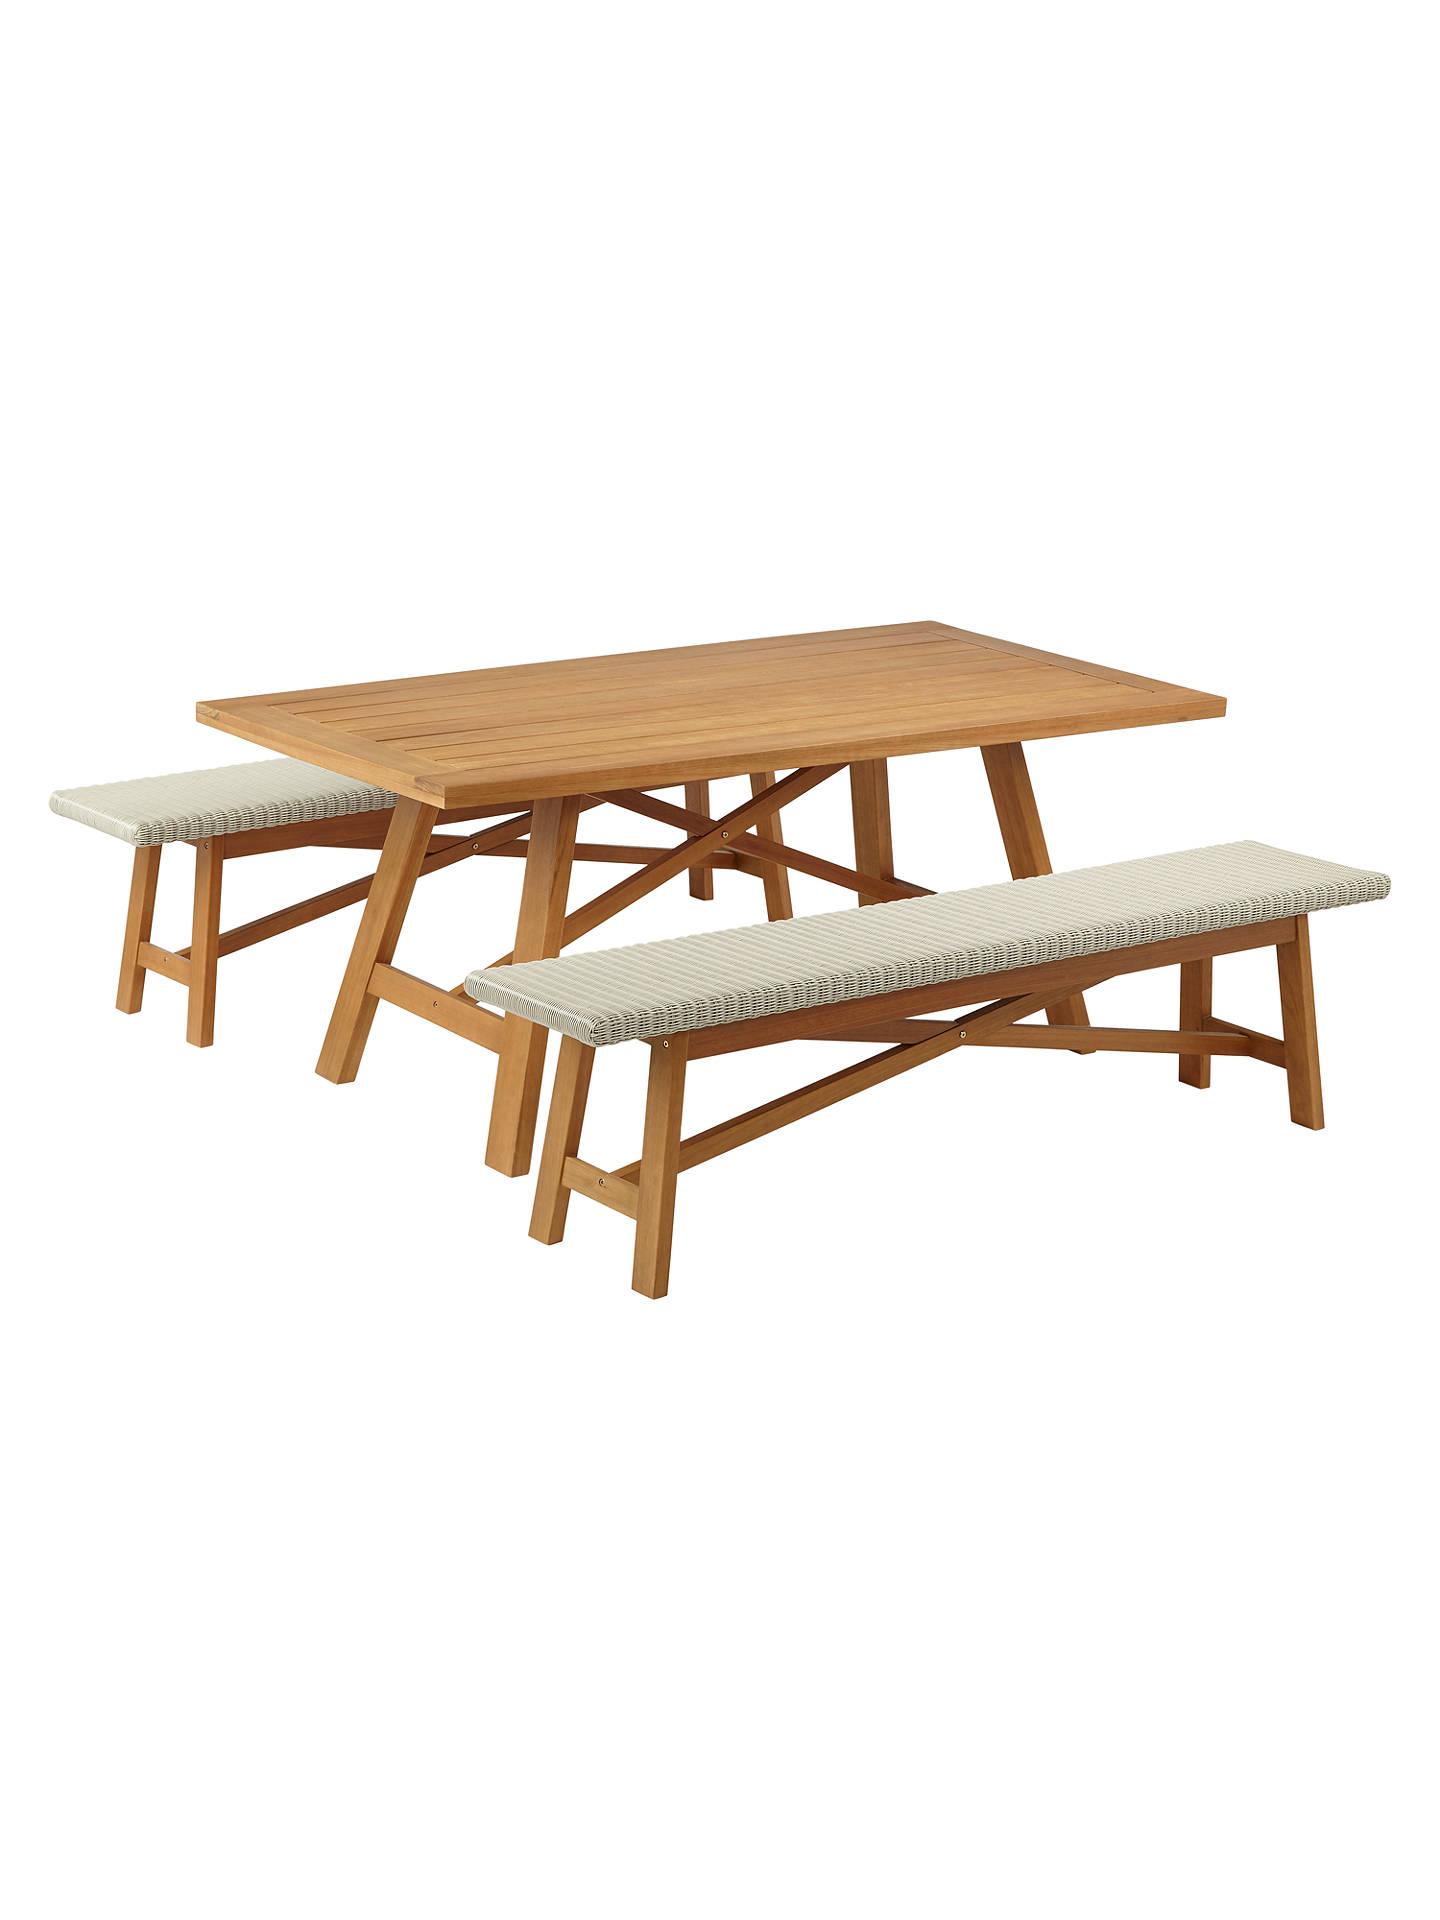 John Lewis Partners Stockholm 6 Seater Garden Dining Table Bench